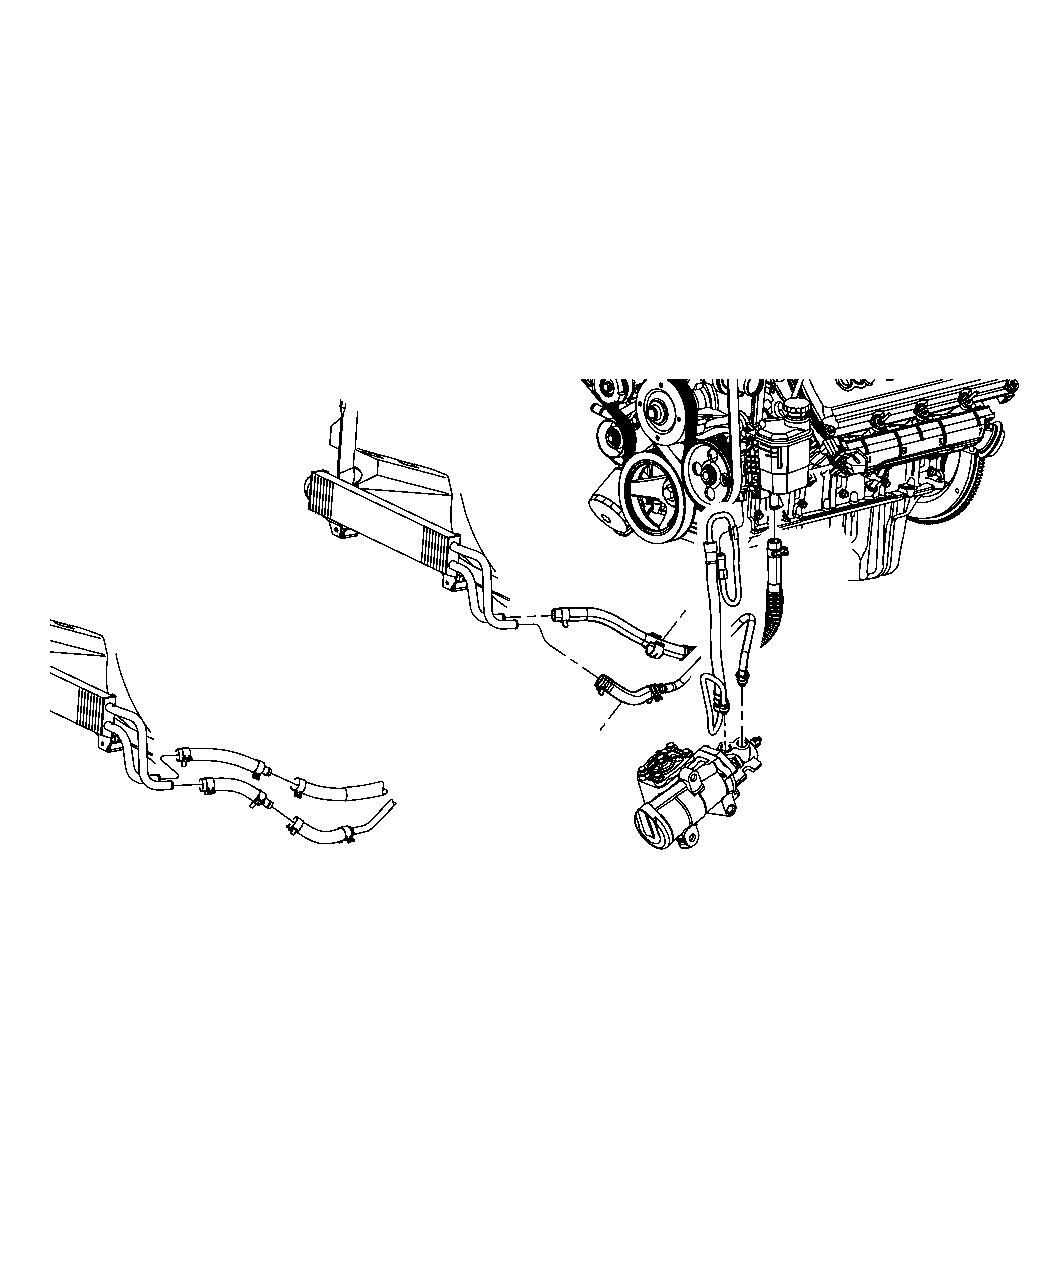 Ram Cooler Power Steering